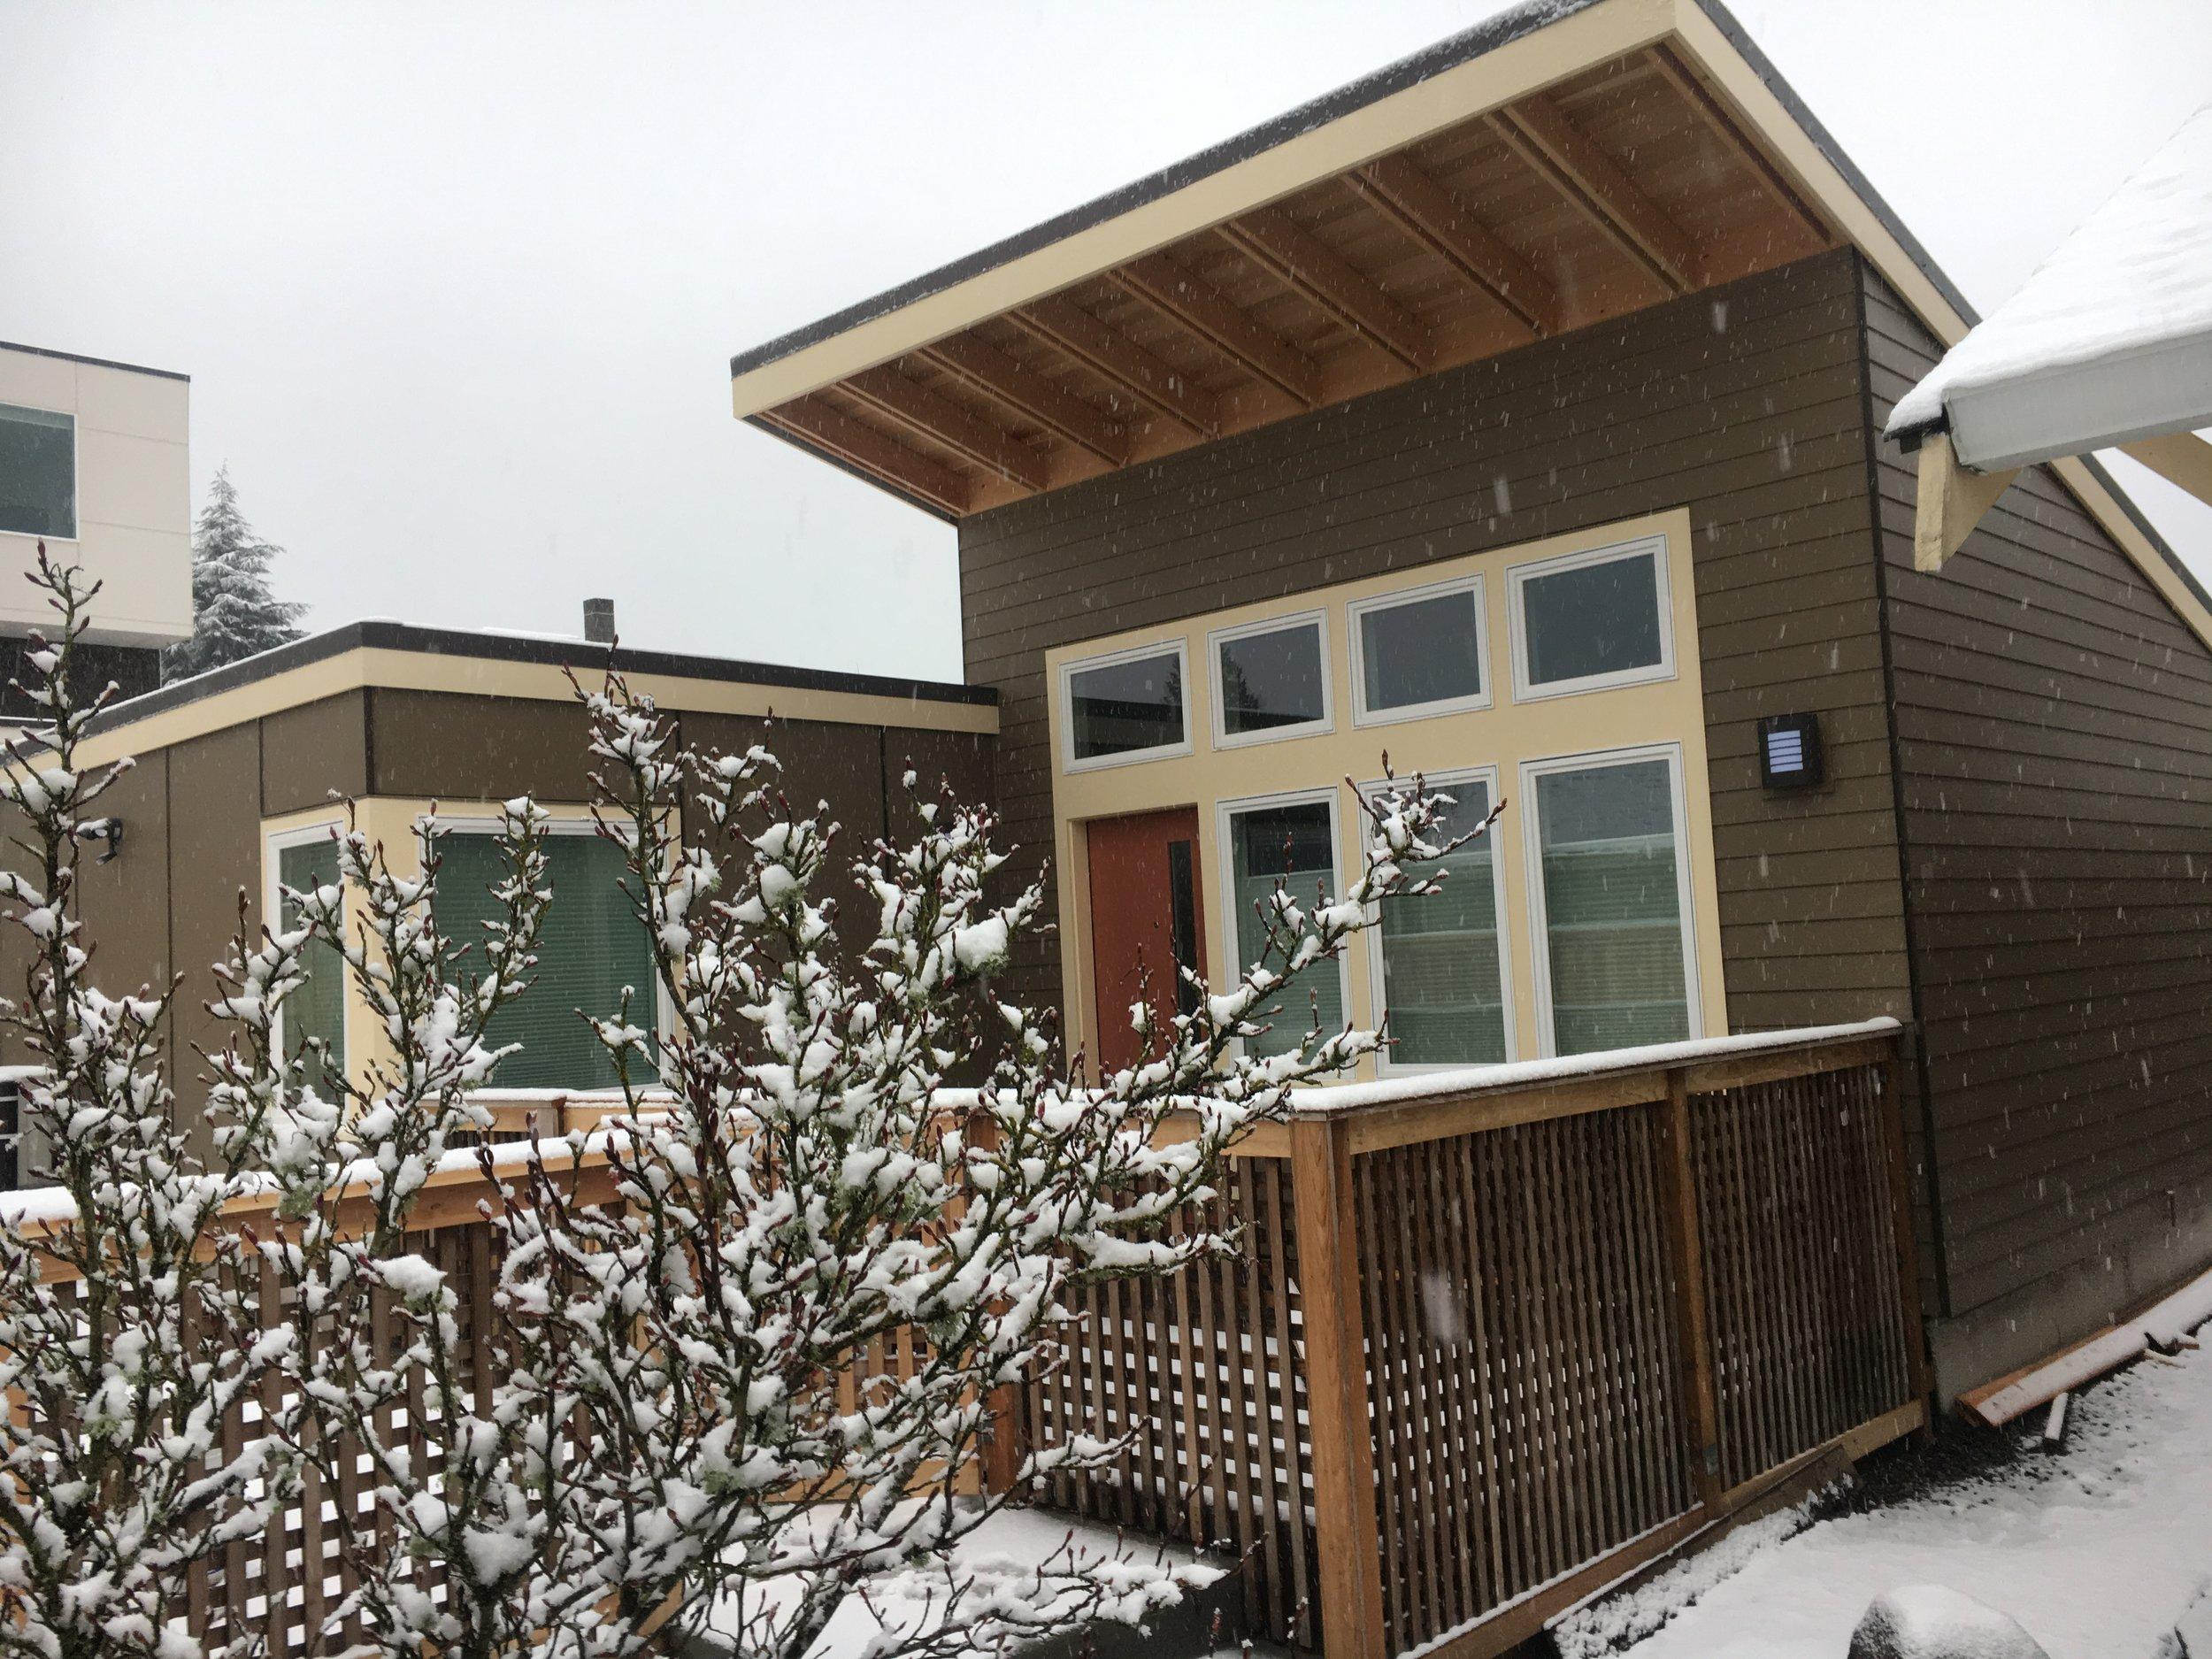 Hoag Cottage - A energy-efficient 600 SF cottage.